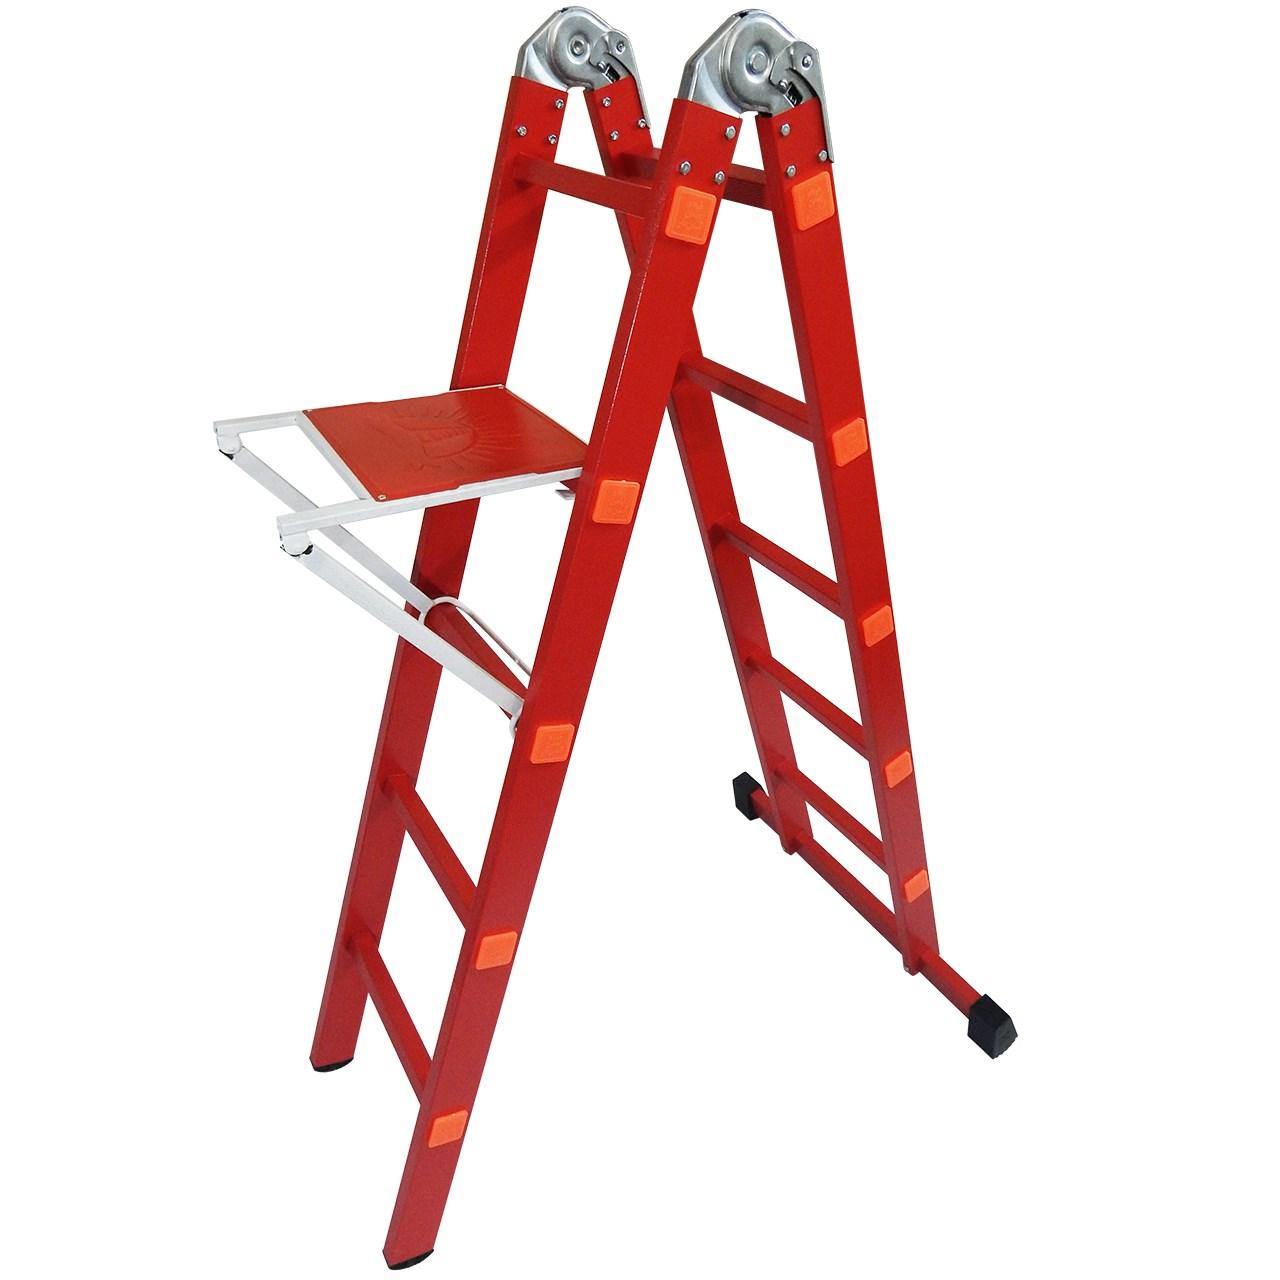 قیمت نردبان ۱۰ پله آسانکار مدل As10s